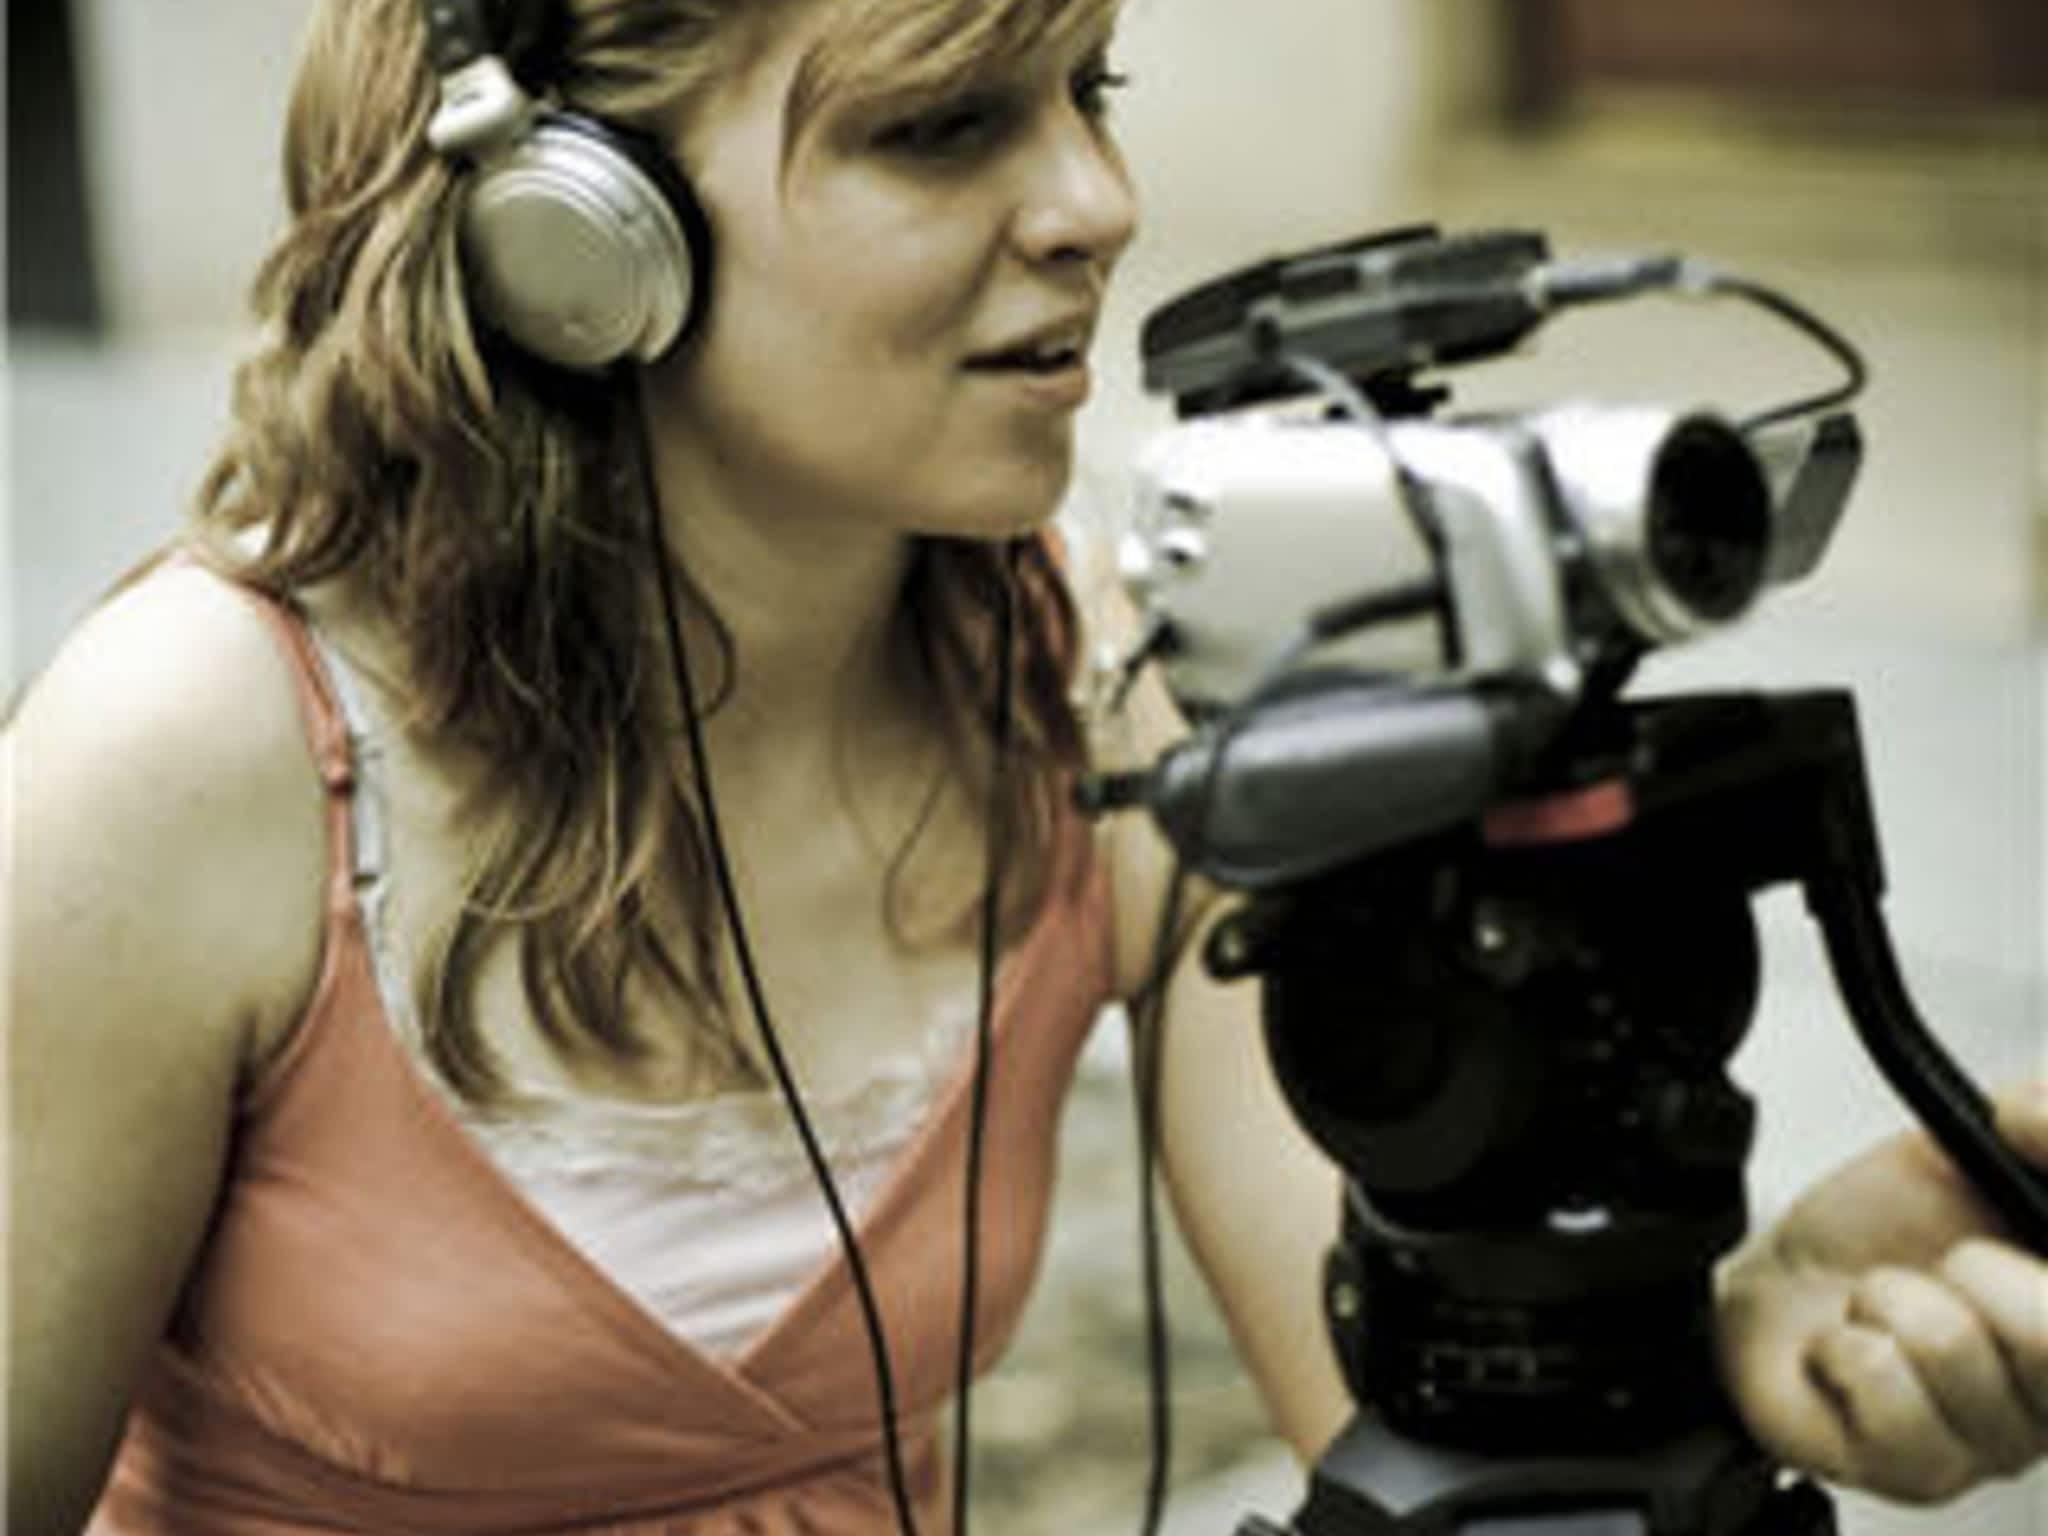 photo Hamblen's Audio / Video Service